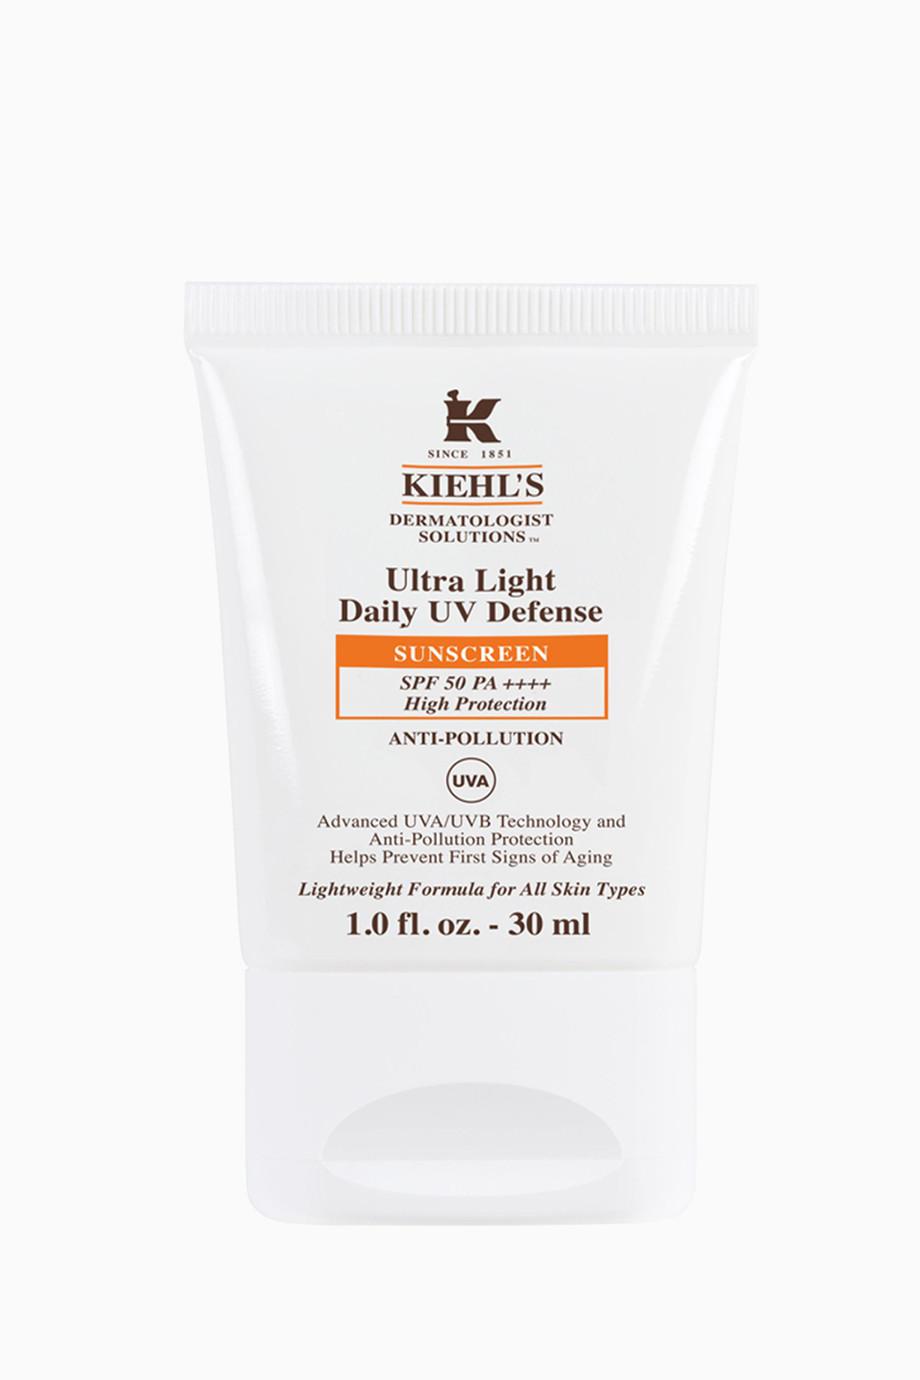 Ultra Light Daily UV Defense SPF 50 PA++++, 30ml. Kiehl's